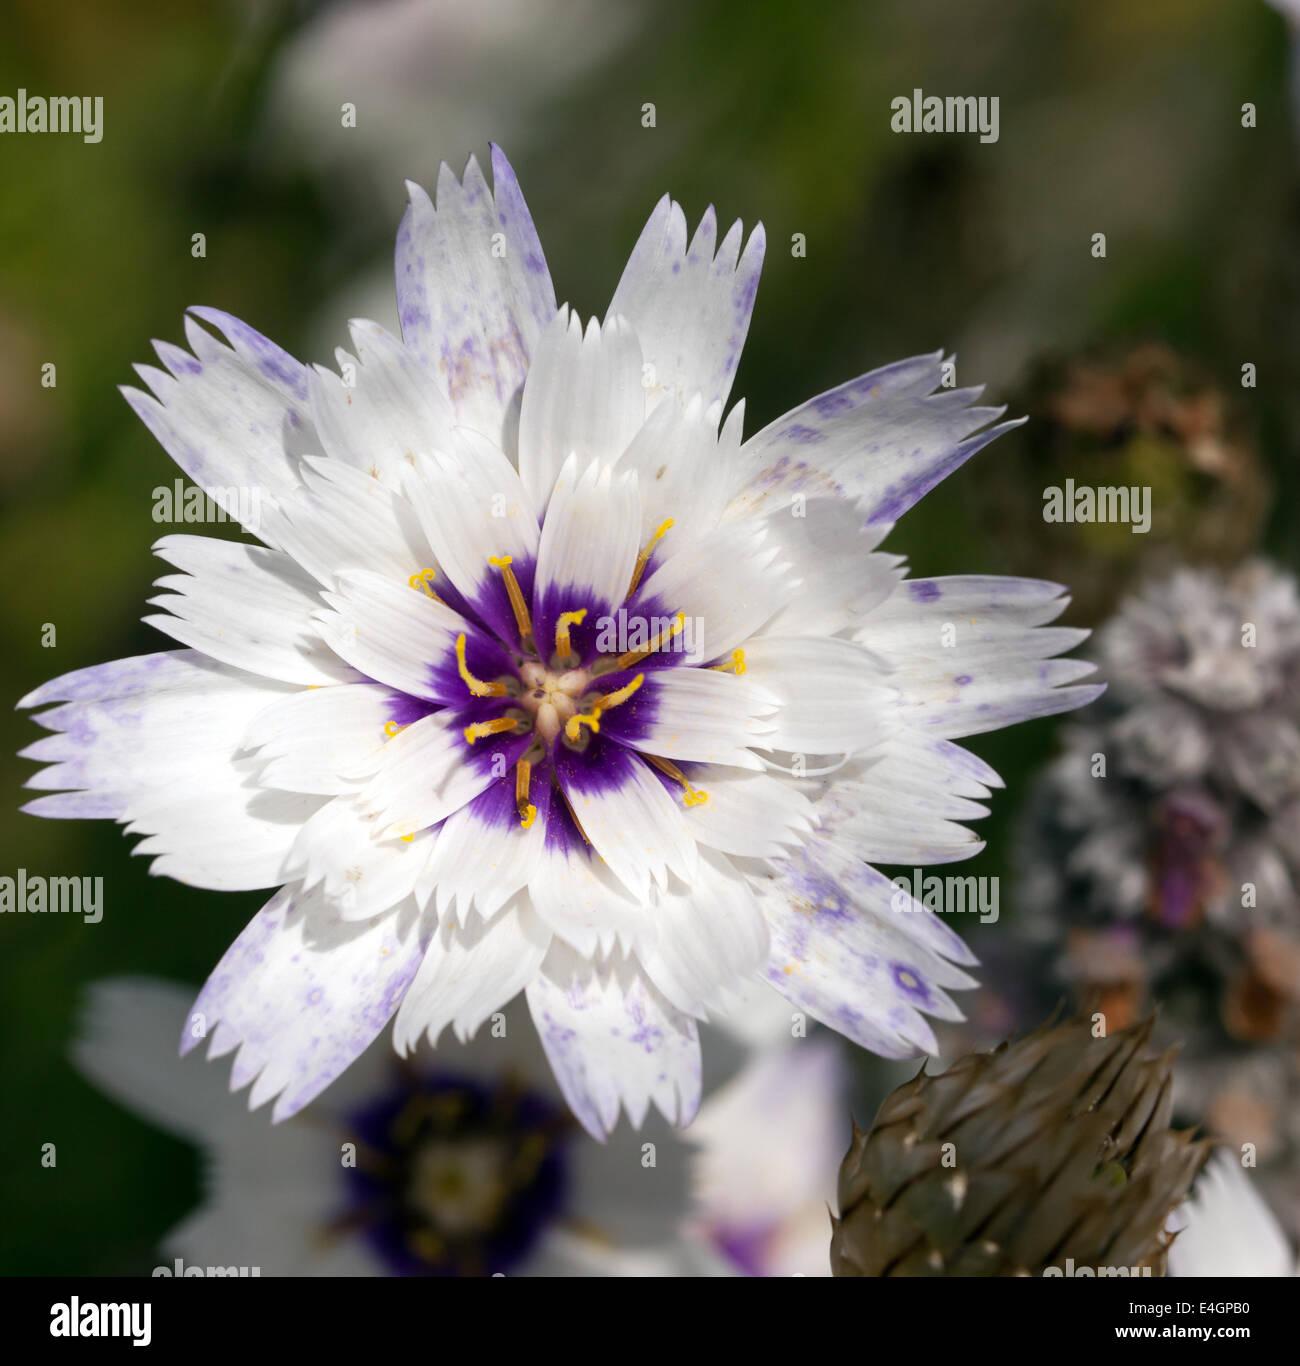 Imagen macro de una sola flor de Catananche caerulea 'amor' blanca Imagen De Stock